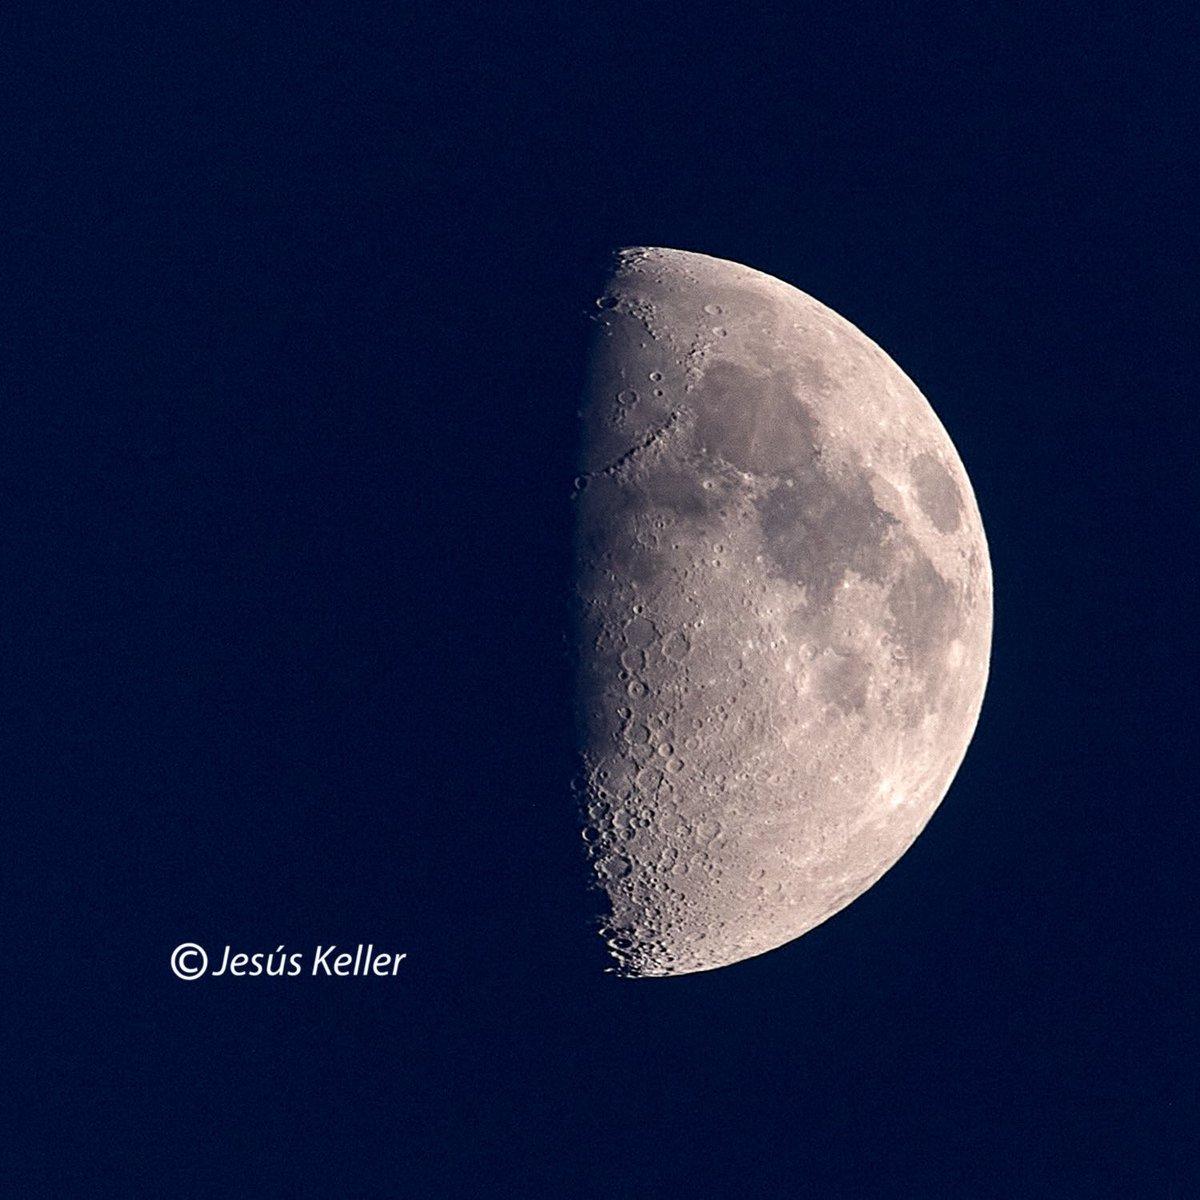 #luna #moon #hoy  #desdelaventana #desdemiventana #primavera  @canonespana #canonespaña #historiasencasa #canoneos #canoneos1dsmarkiii #canonlens #canonef100400lisusmii #extender14xii f14 1/160s #ıso400 560mm.pic.twitter.com/xSLNjrmAGZ